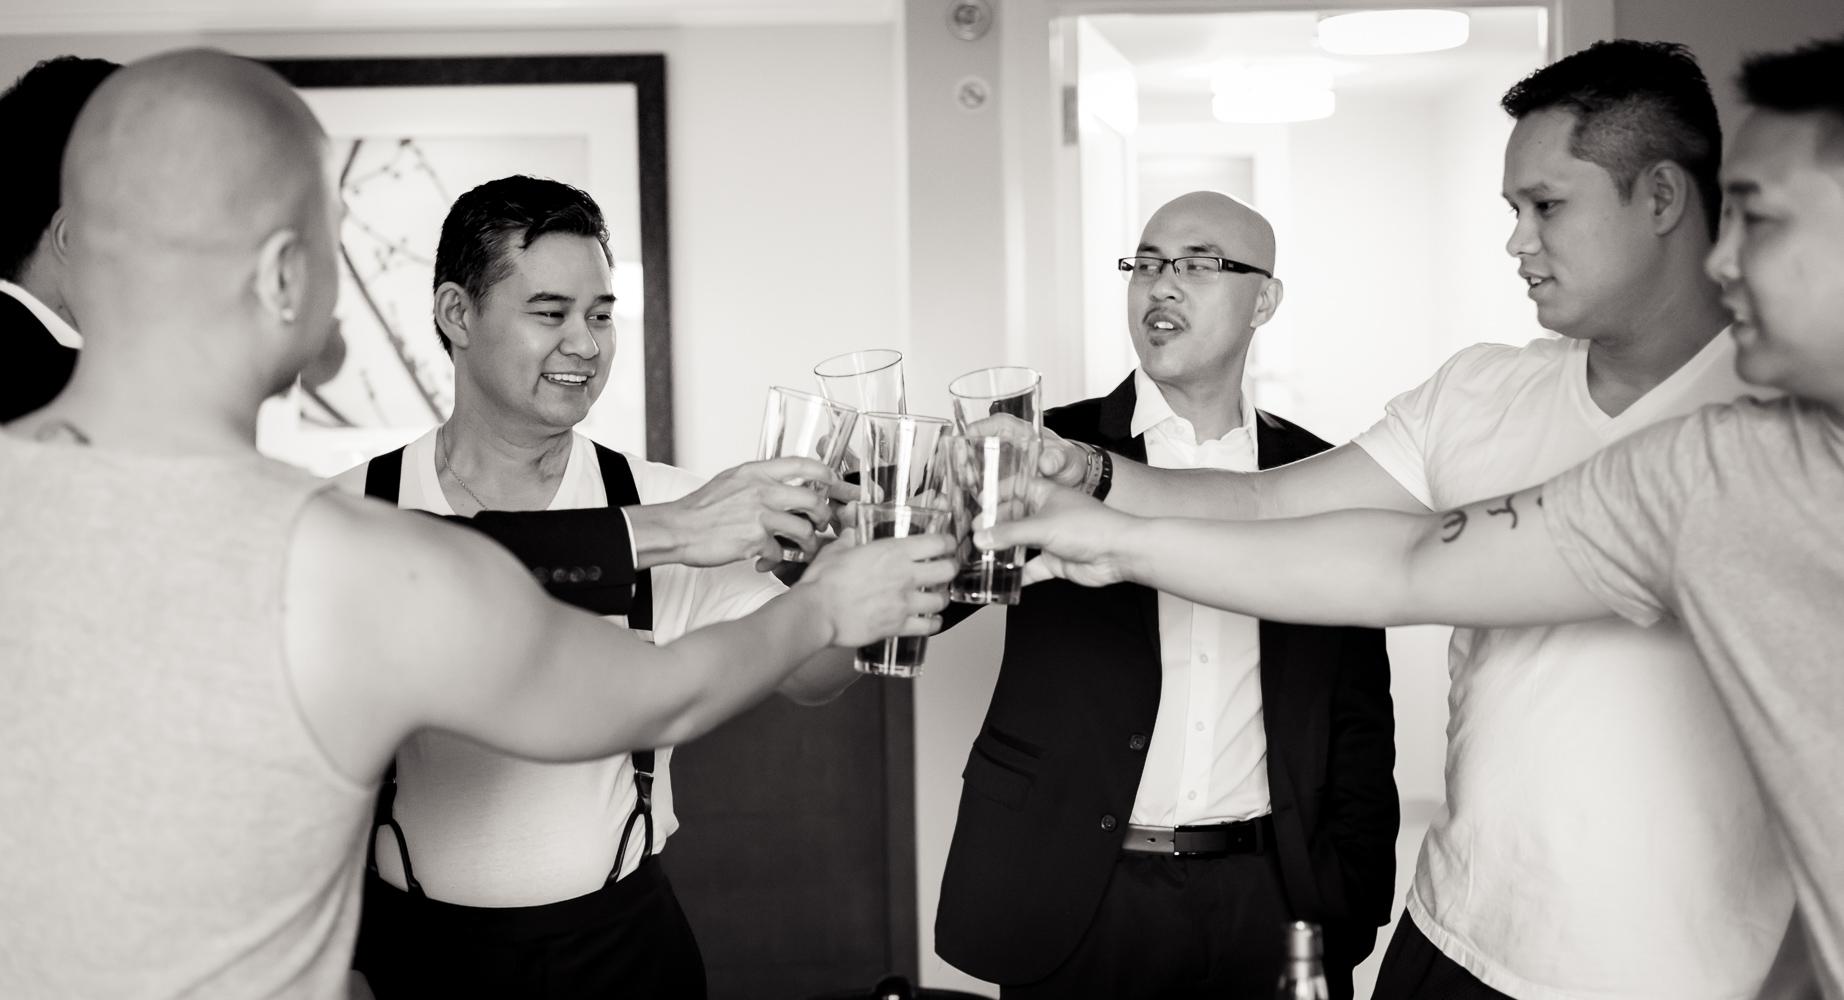 Wedding-photography-and-videos-austin-091.jpg